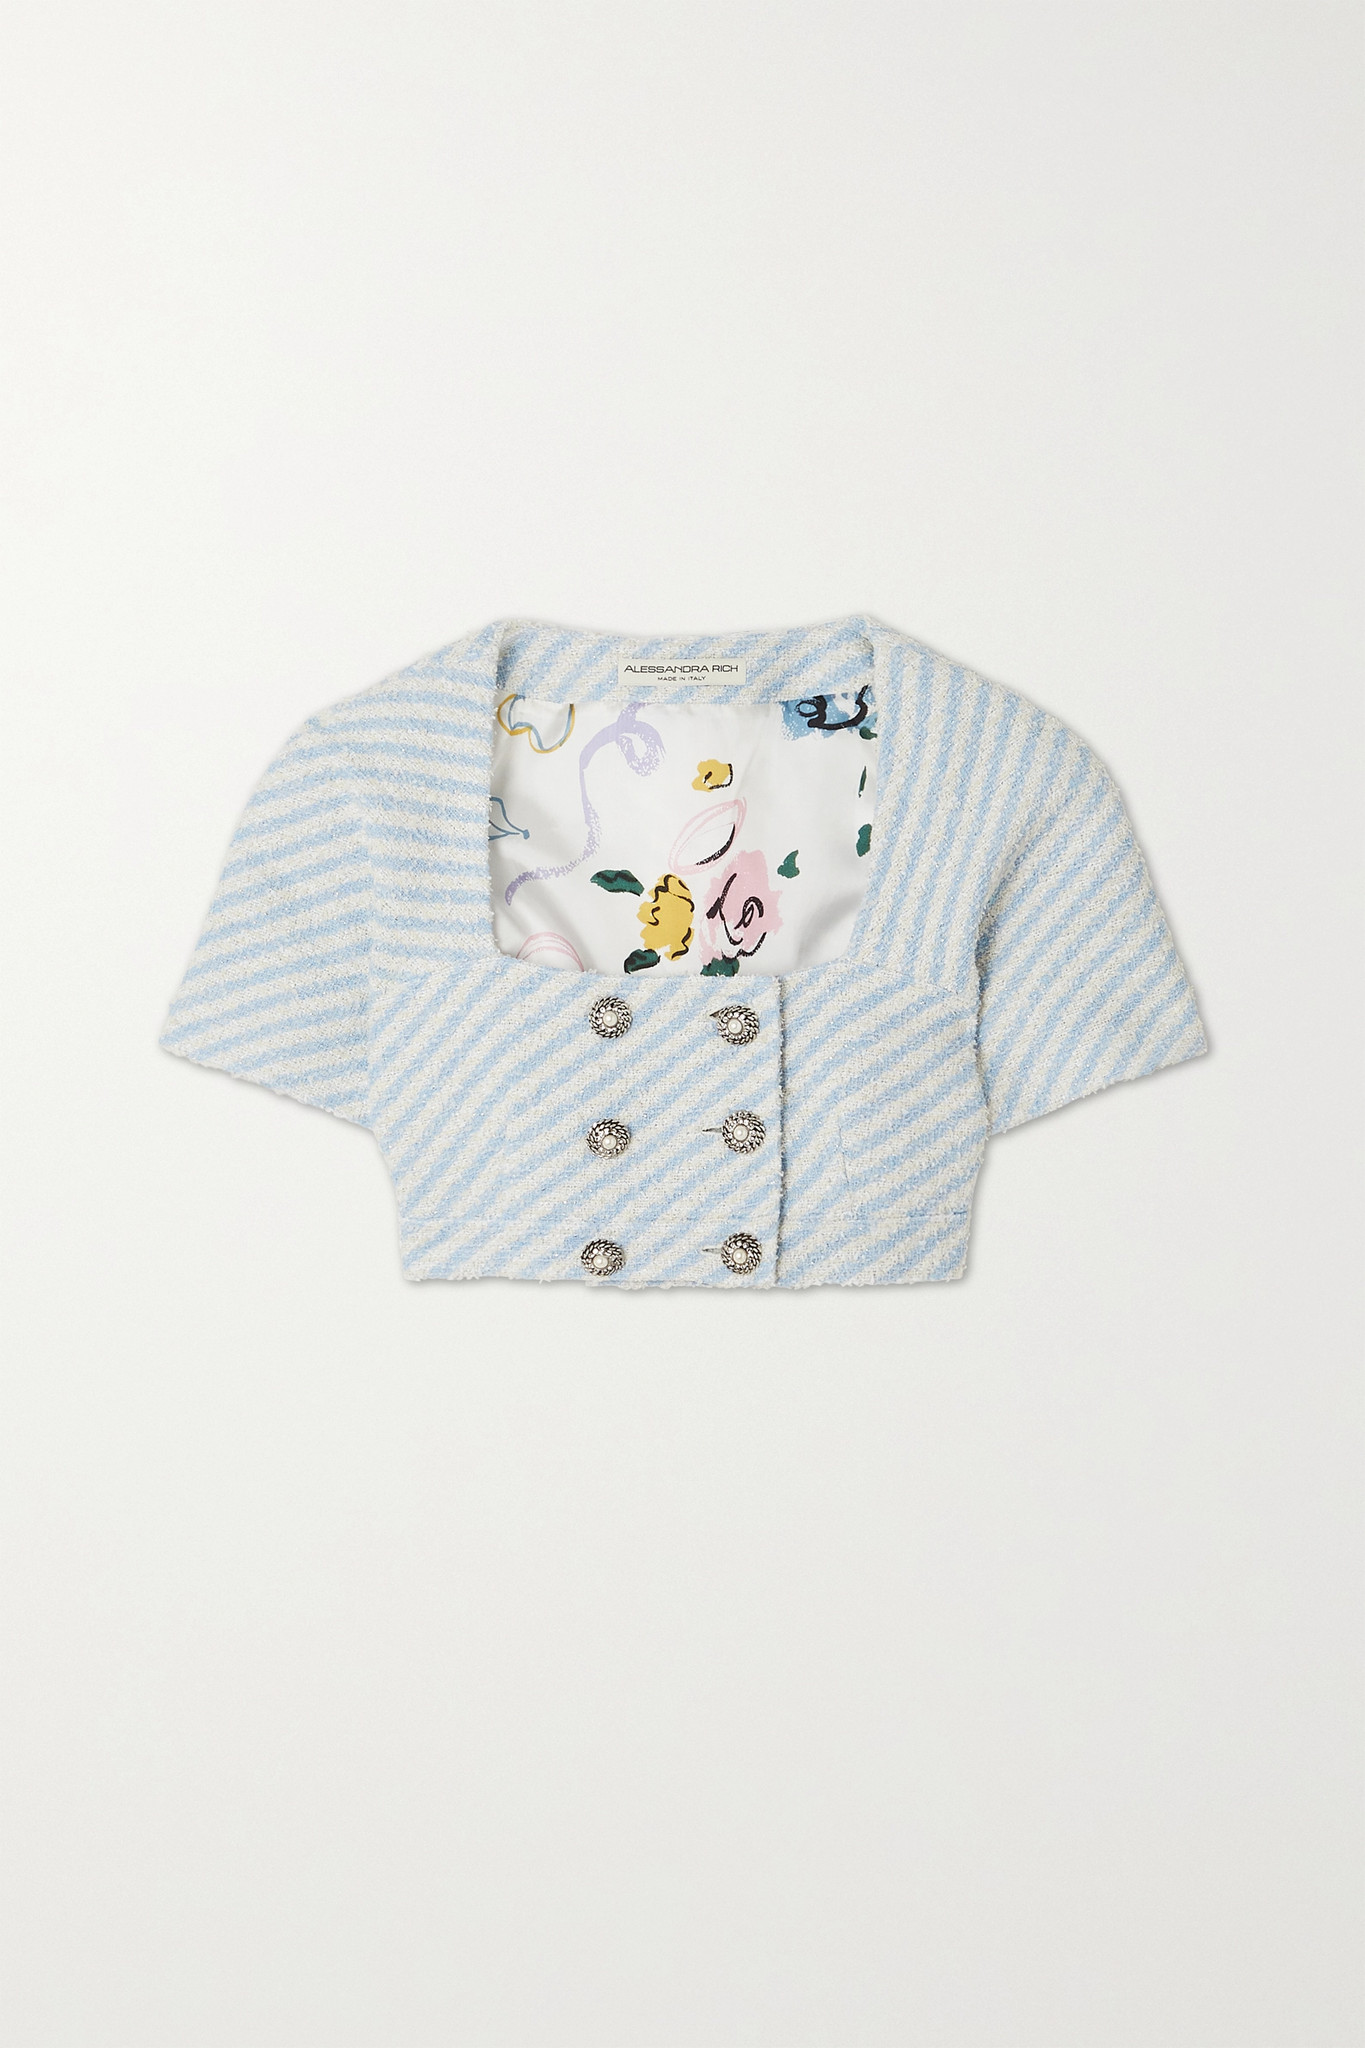 ALESSANDRA RICH - 条纹棉质混纺花呢短款外套 - 蓝色 - IT40